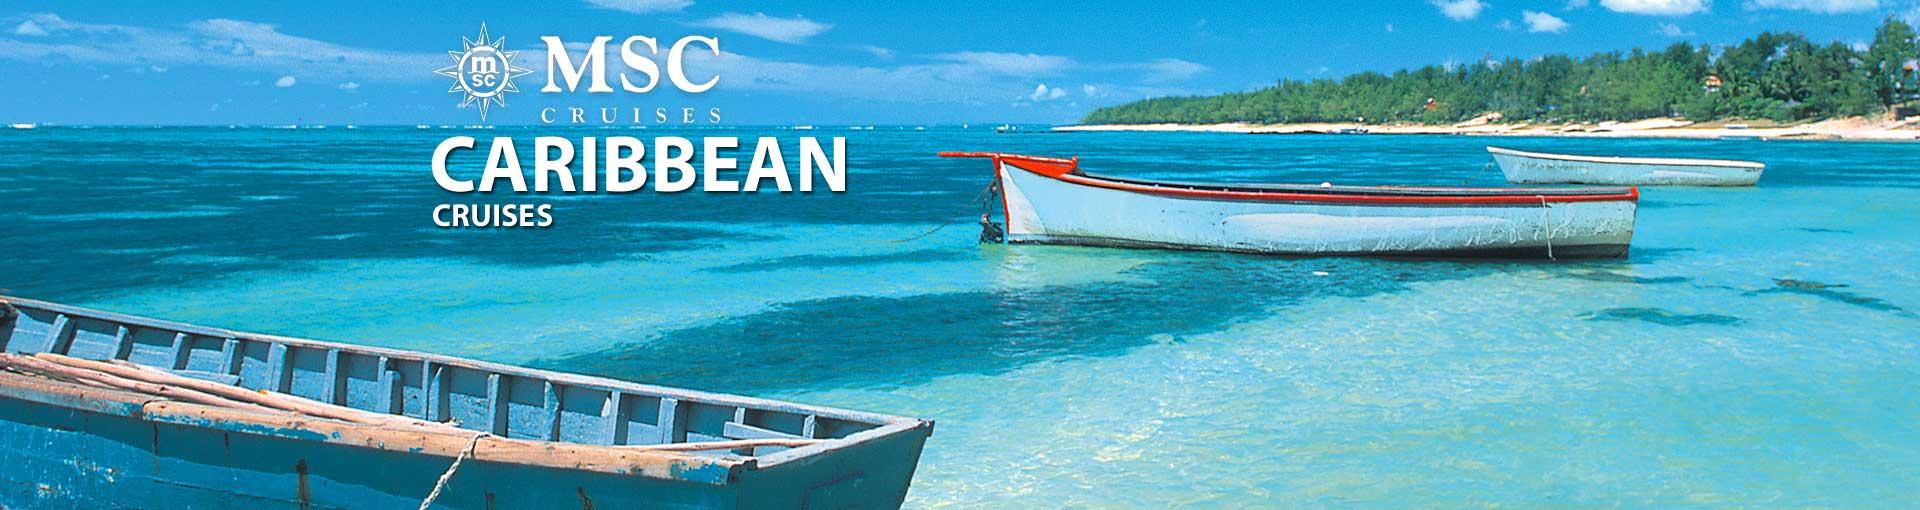 MSC Cruises Caribbean Cruises